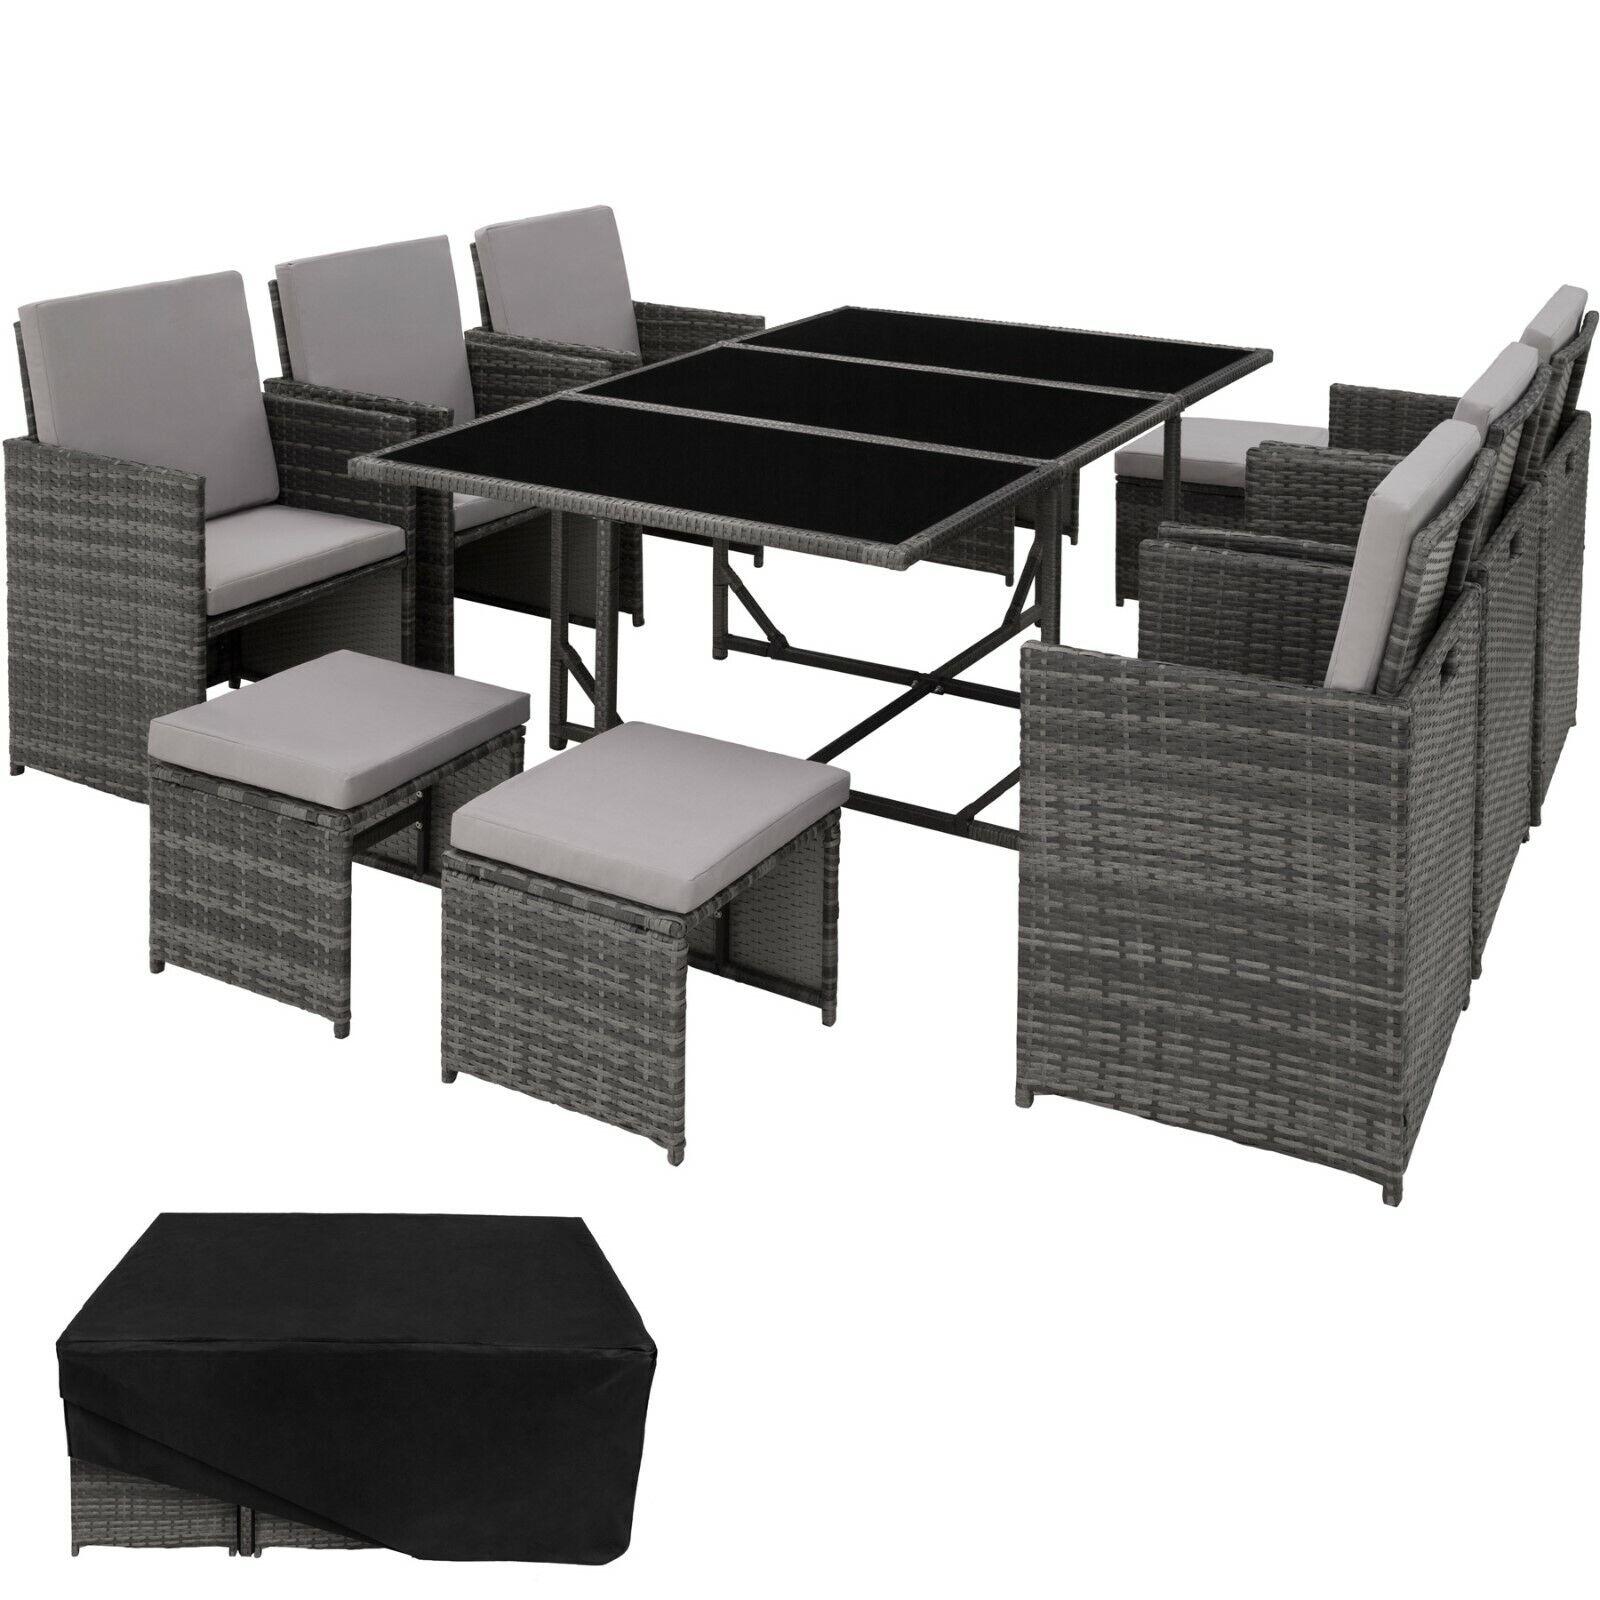 Poly Rattan Sitzgruppe Gartenmöbel Garten Lounge 6x Stuhl Tisch 4x Hocker B-Ware